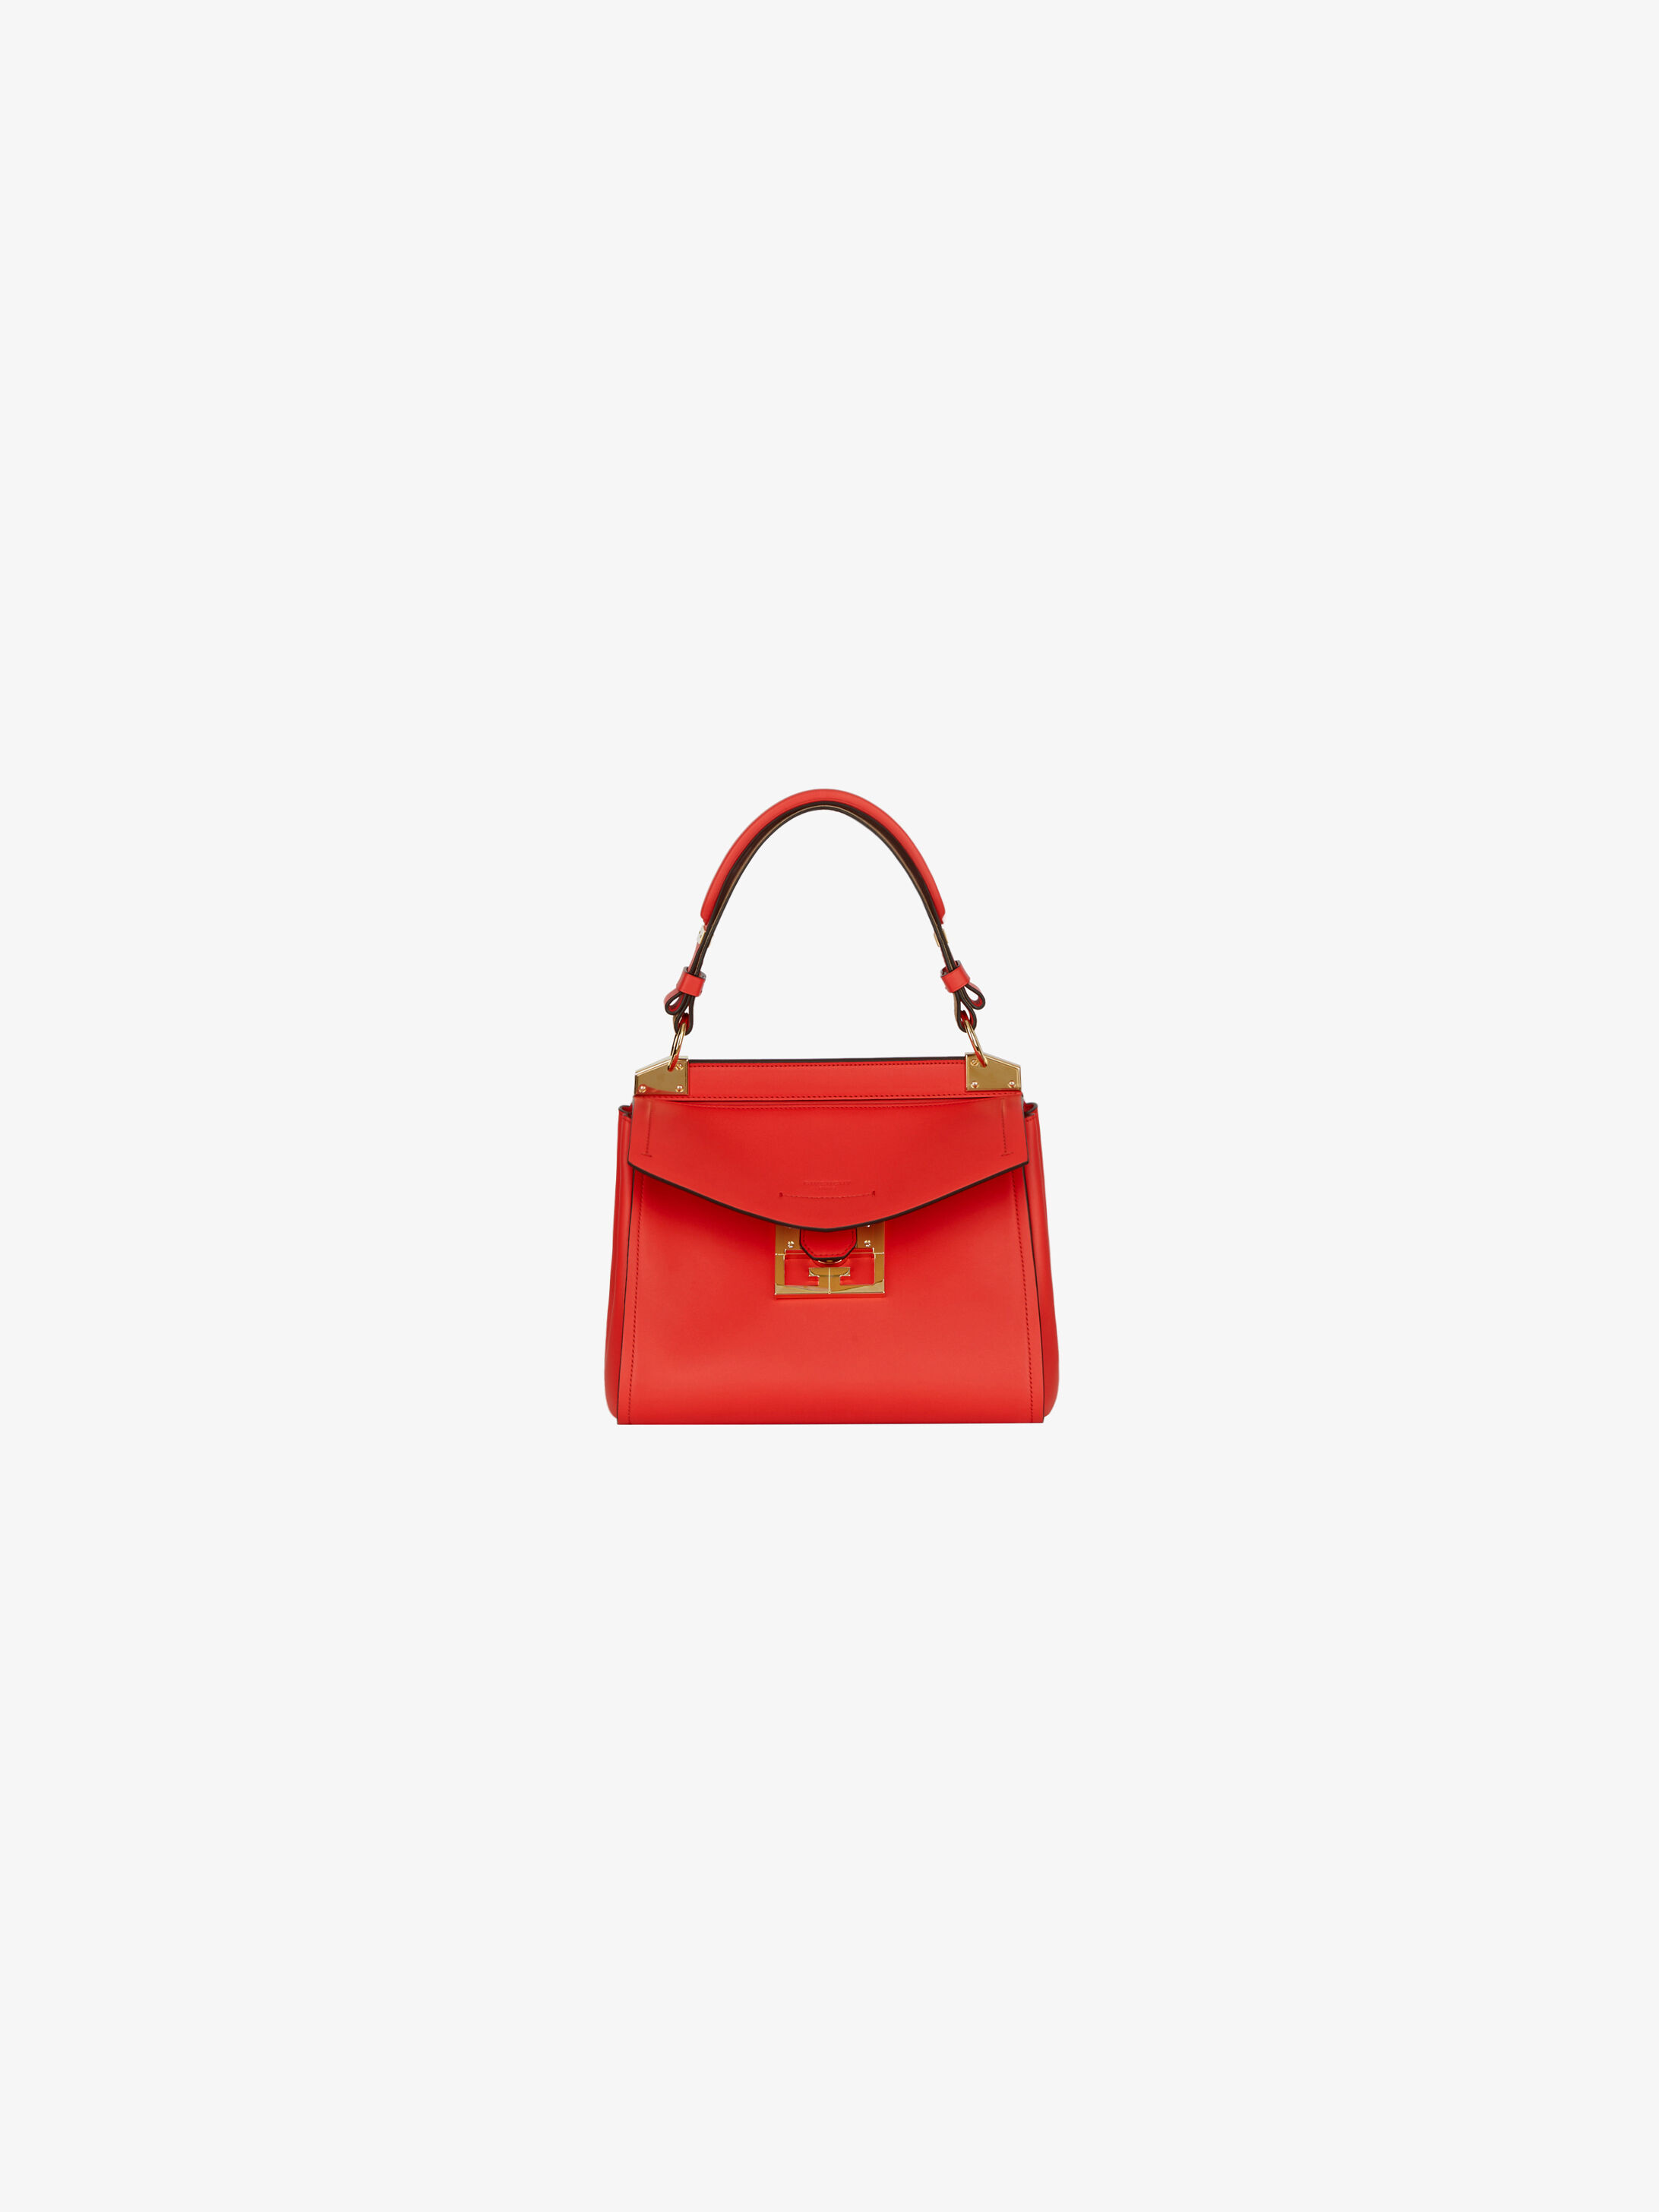 Saks 5th Ave Tote Bag Medium Size Faux Leather Light Blue w//Mini New